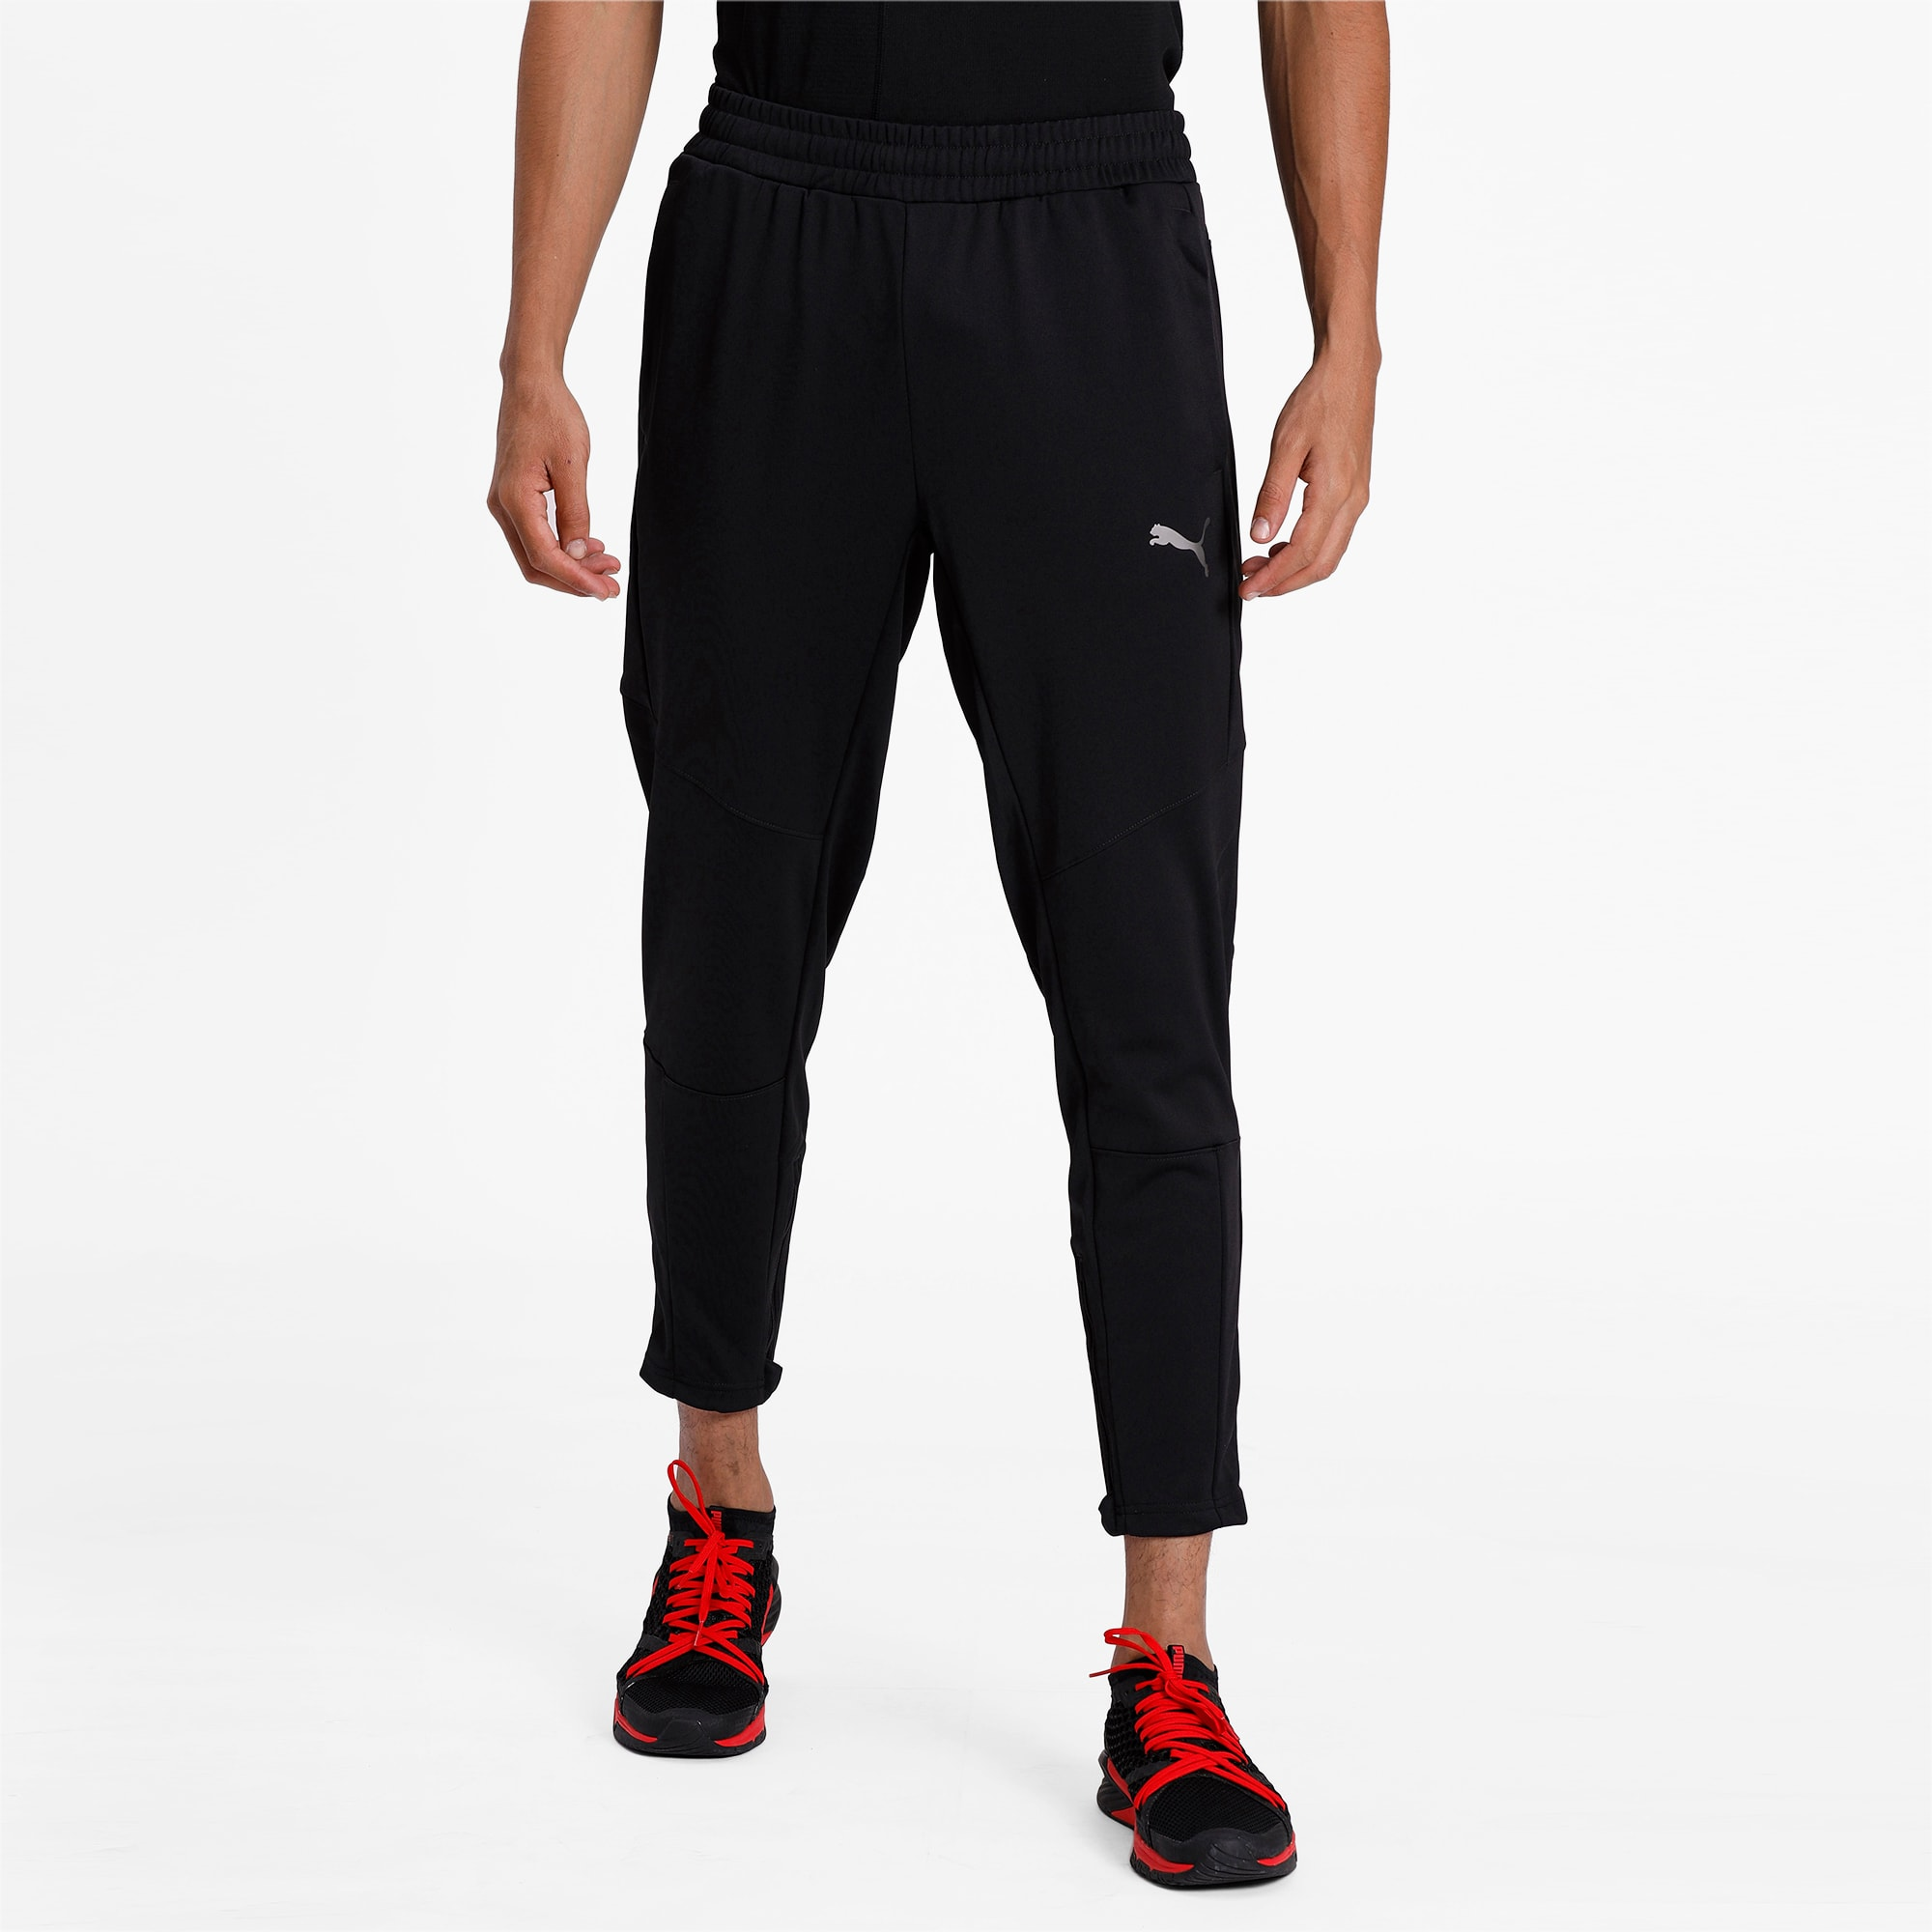 Blaster Woven dryCELL Men's Training Pants | Puma Black | PUMA ...